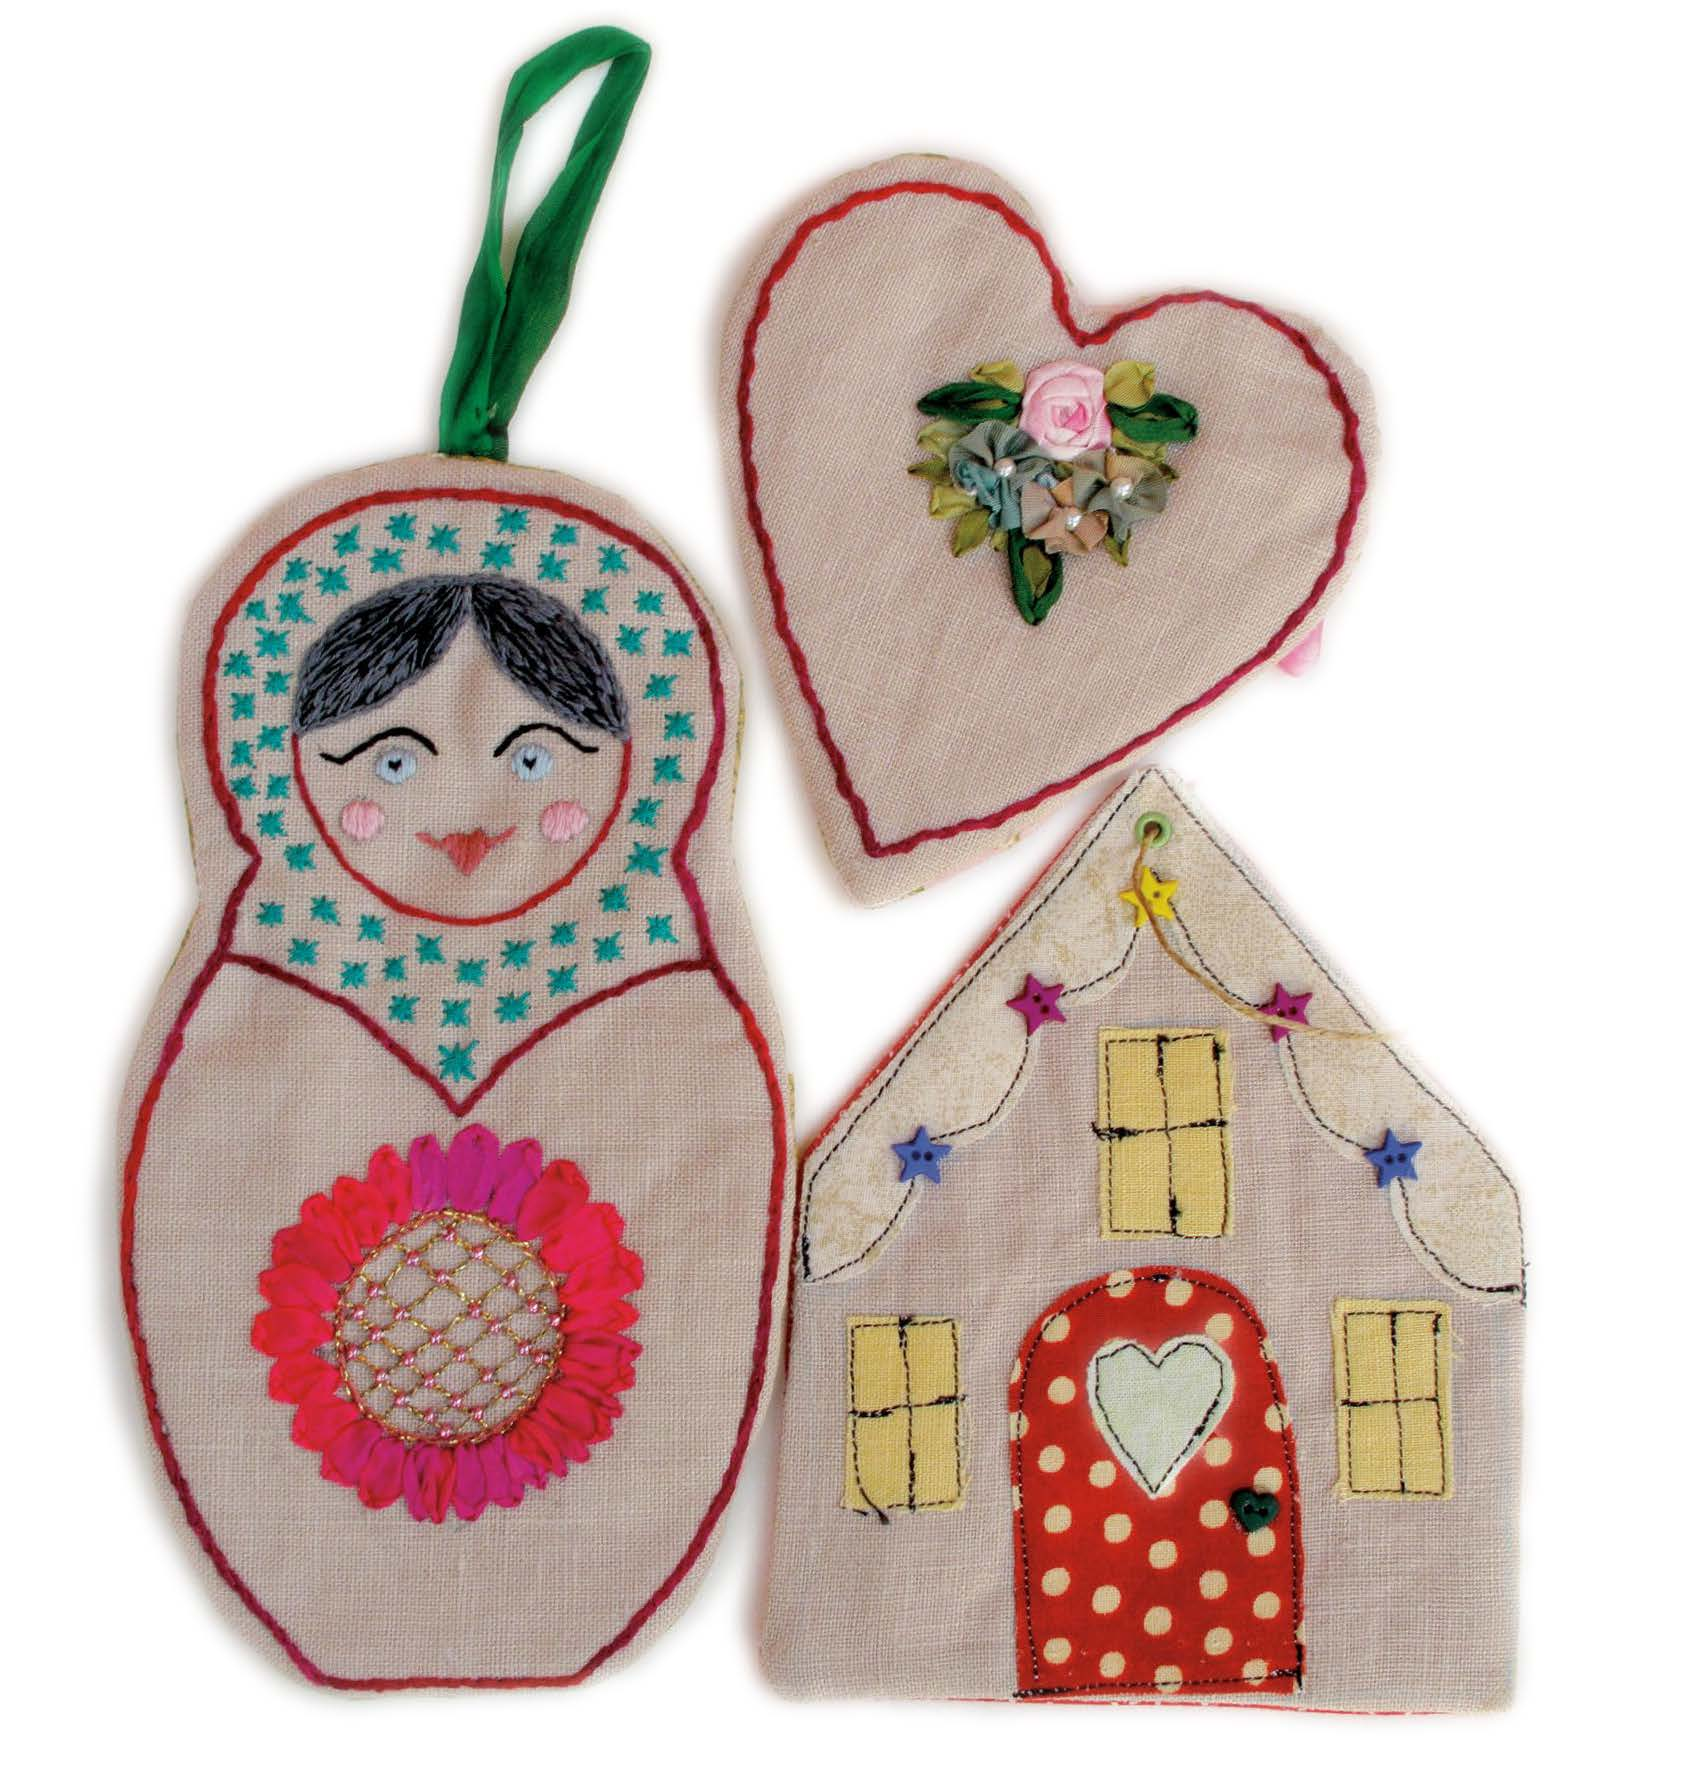 Gift Card Pockets Pattern - Festive 2011